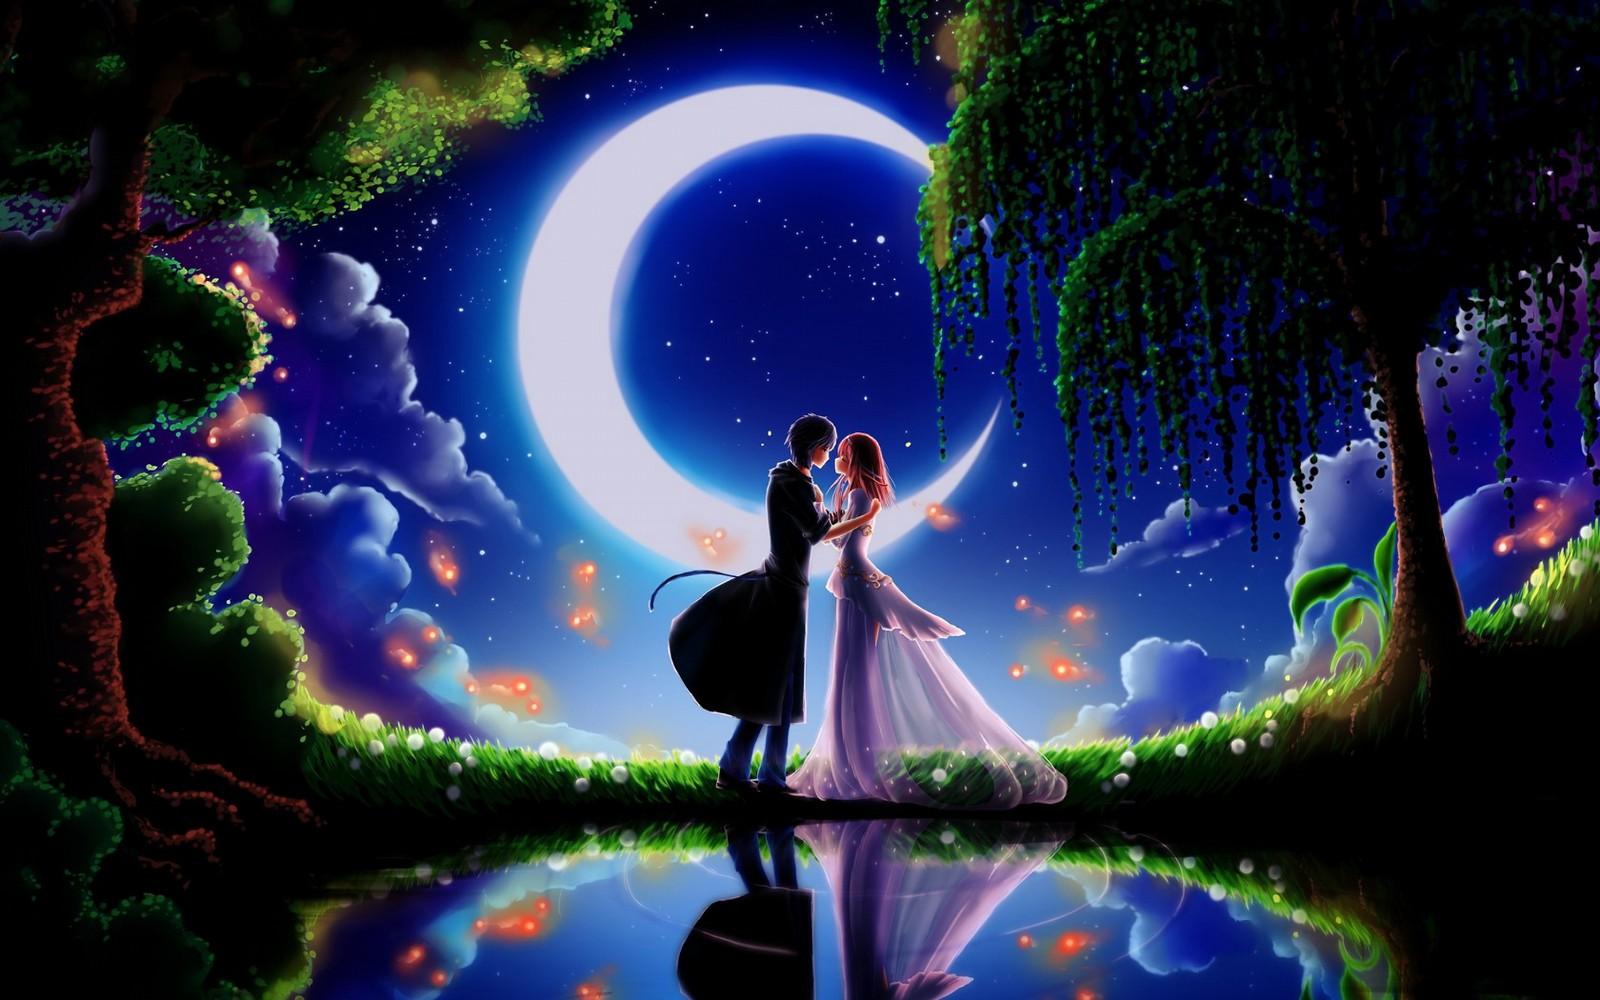 Most Inspiring Wallpaper High Quality Romantic - Romantic-Lovers-HD-Wallpaper  Snapshot_973530.jpg